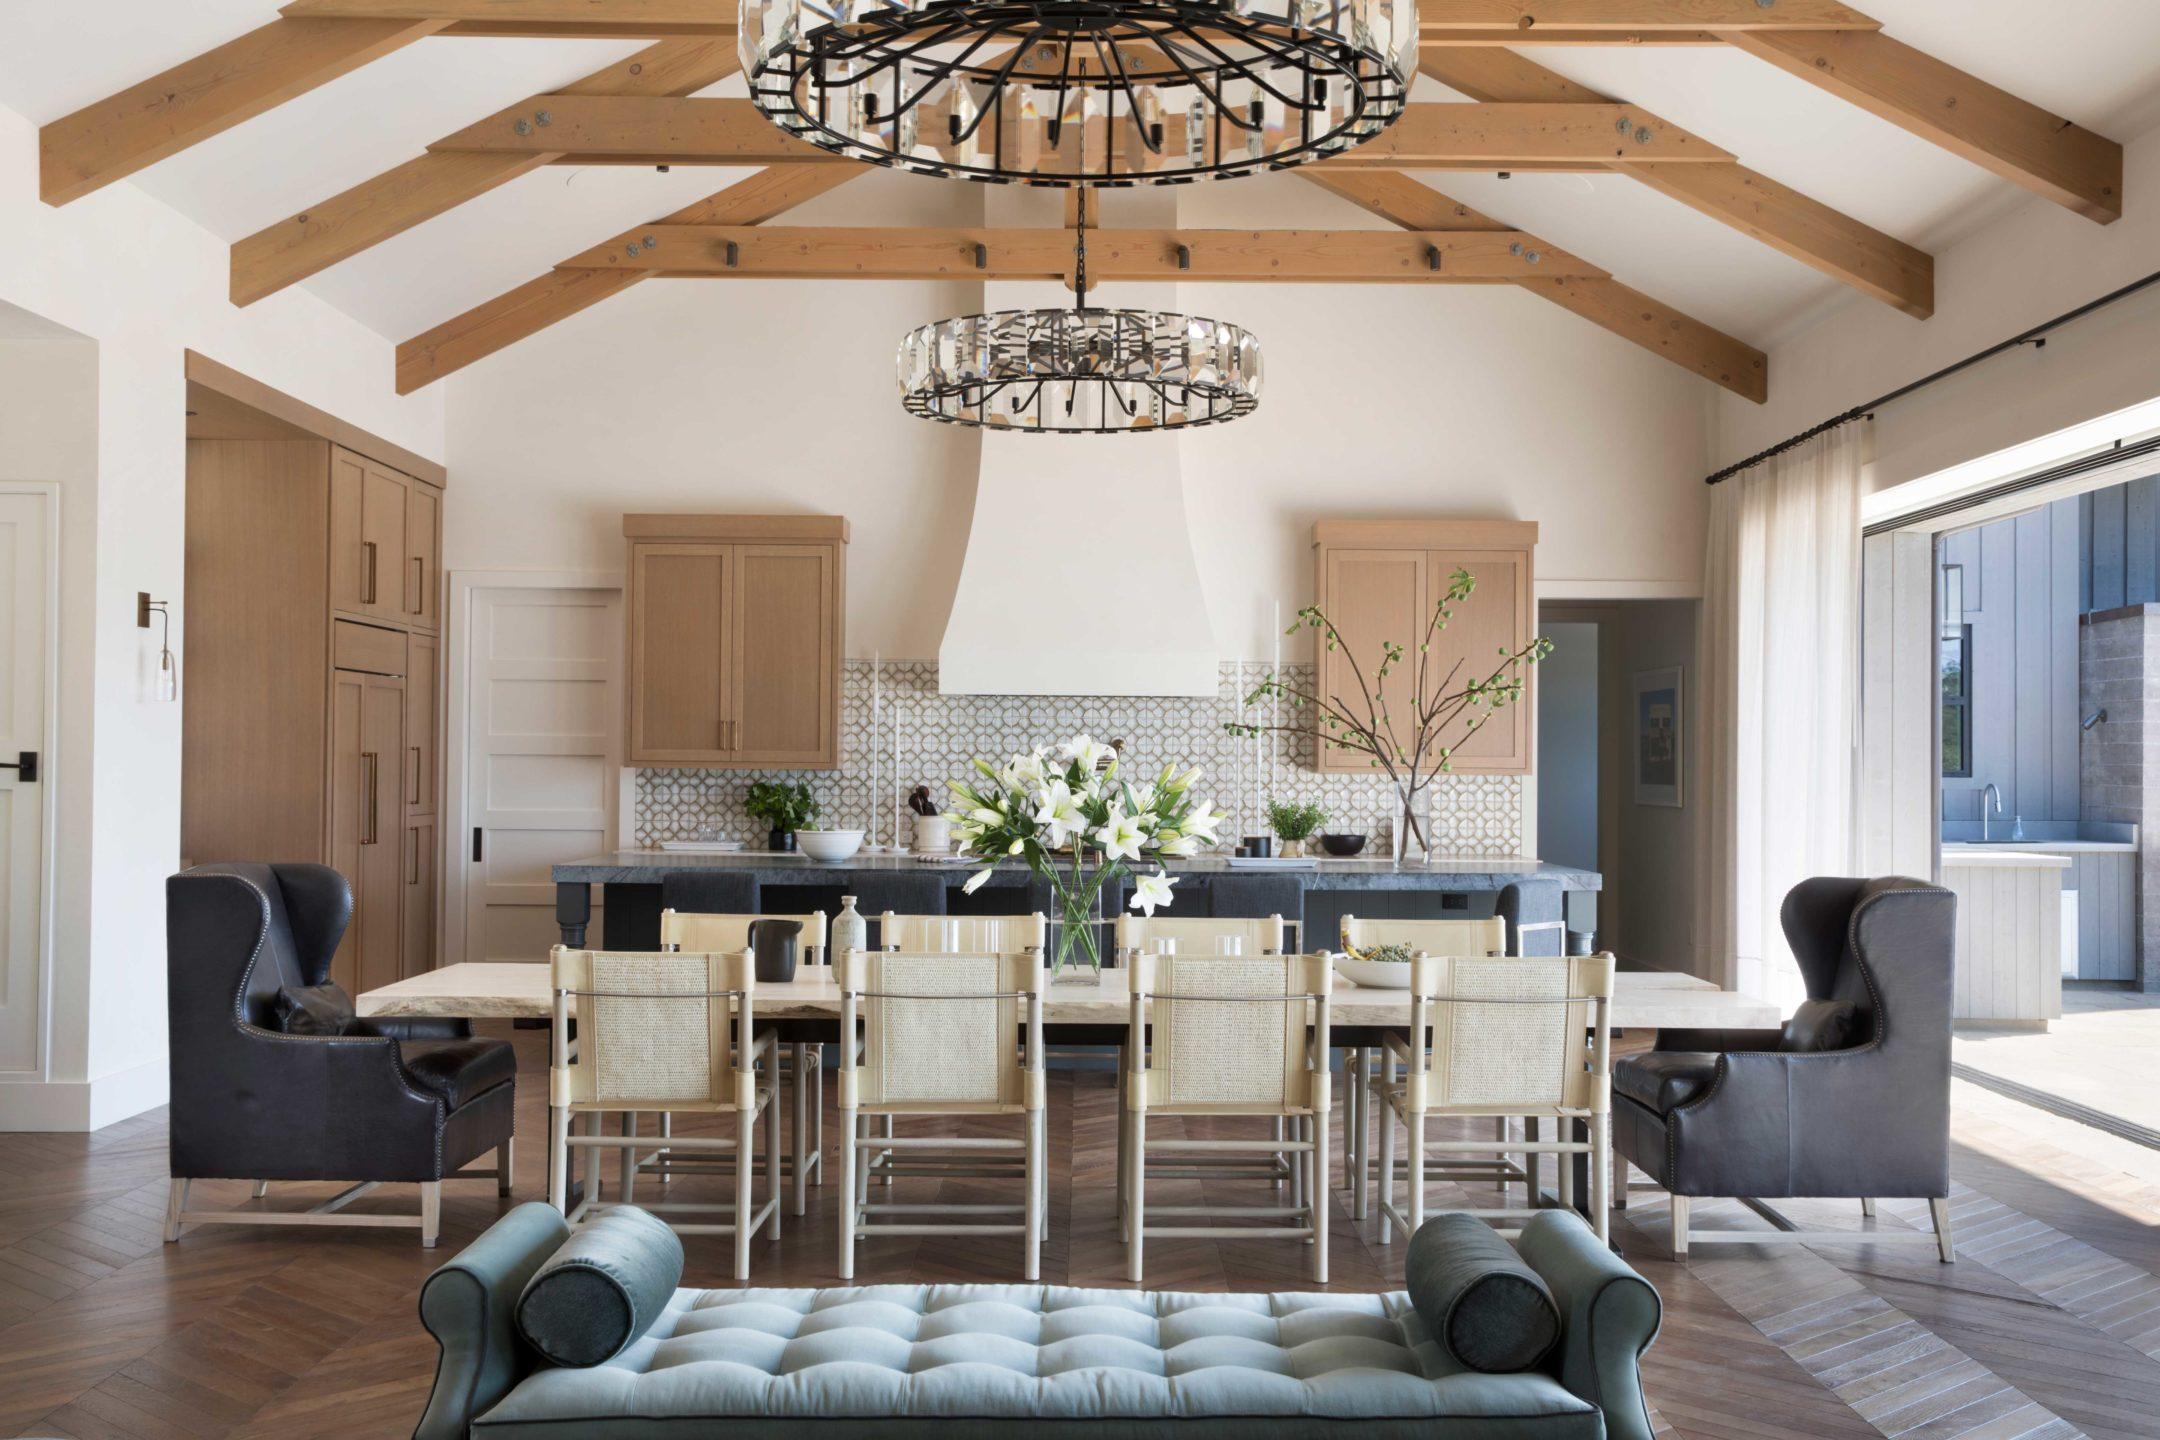 Jennifer_robins_interiors_projects_st_helena_LR_living_room_4Conn_08_HR